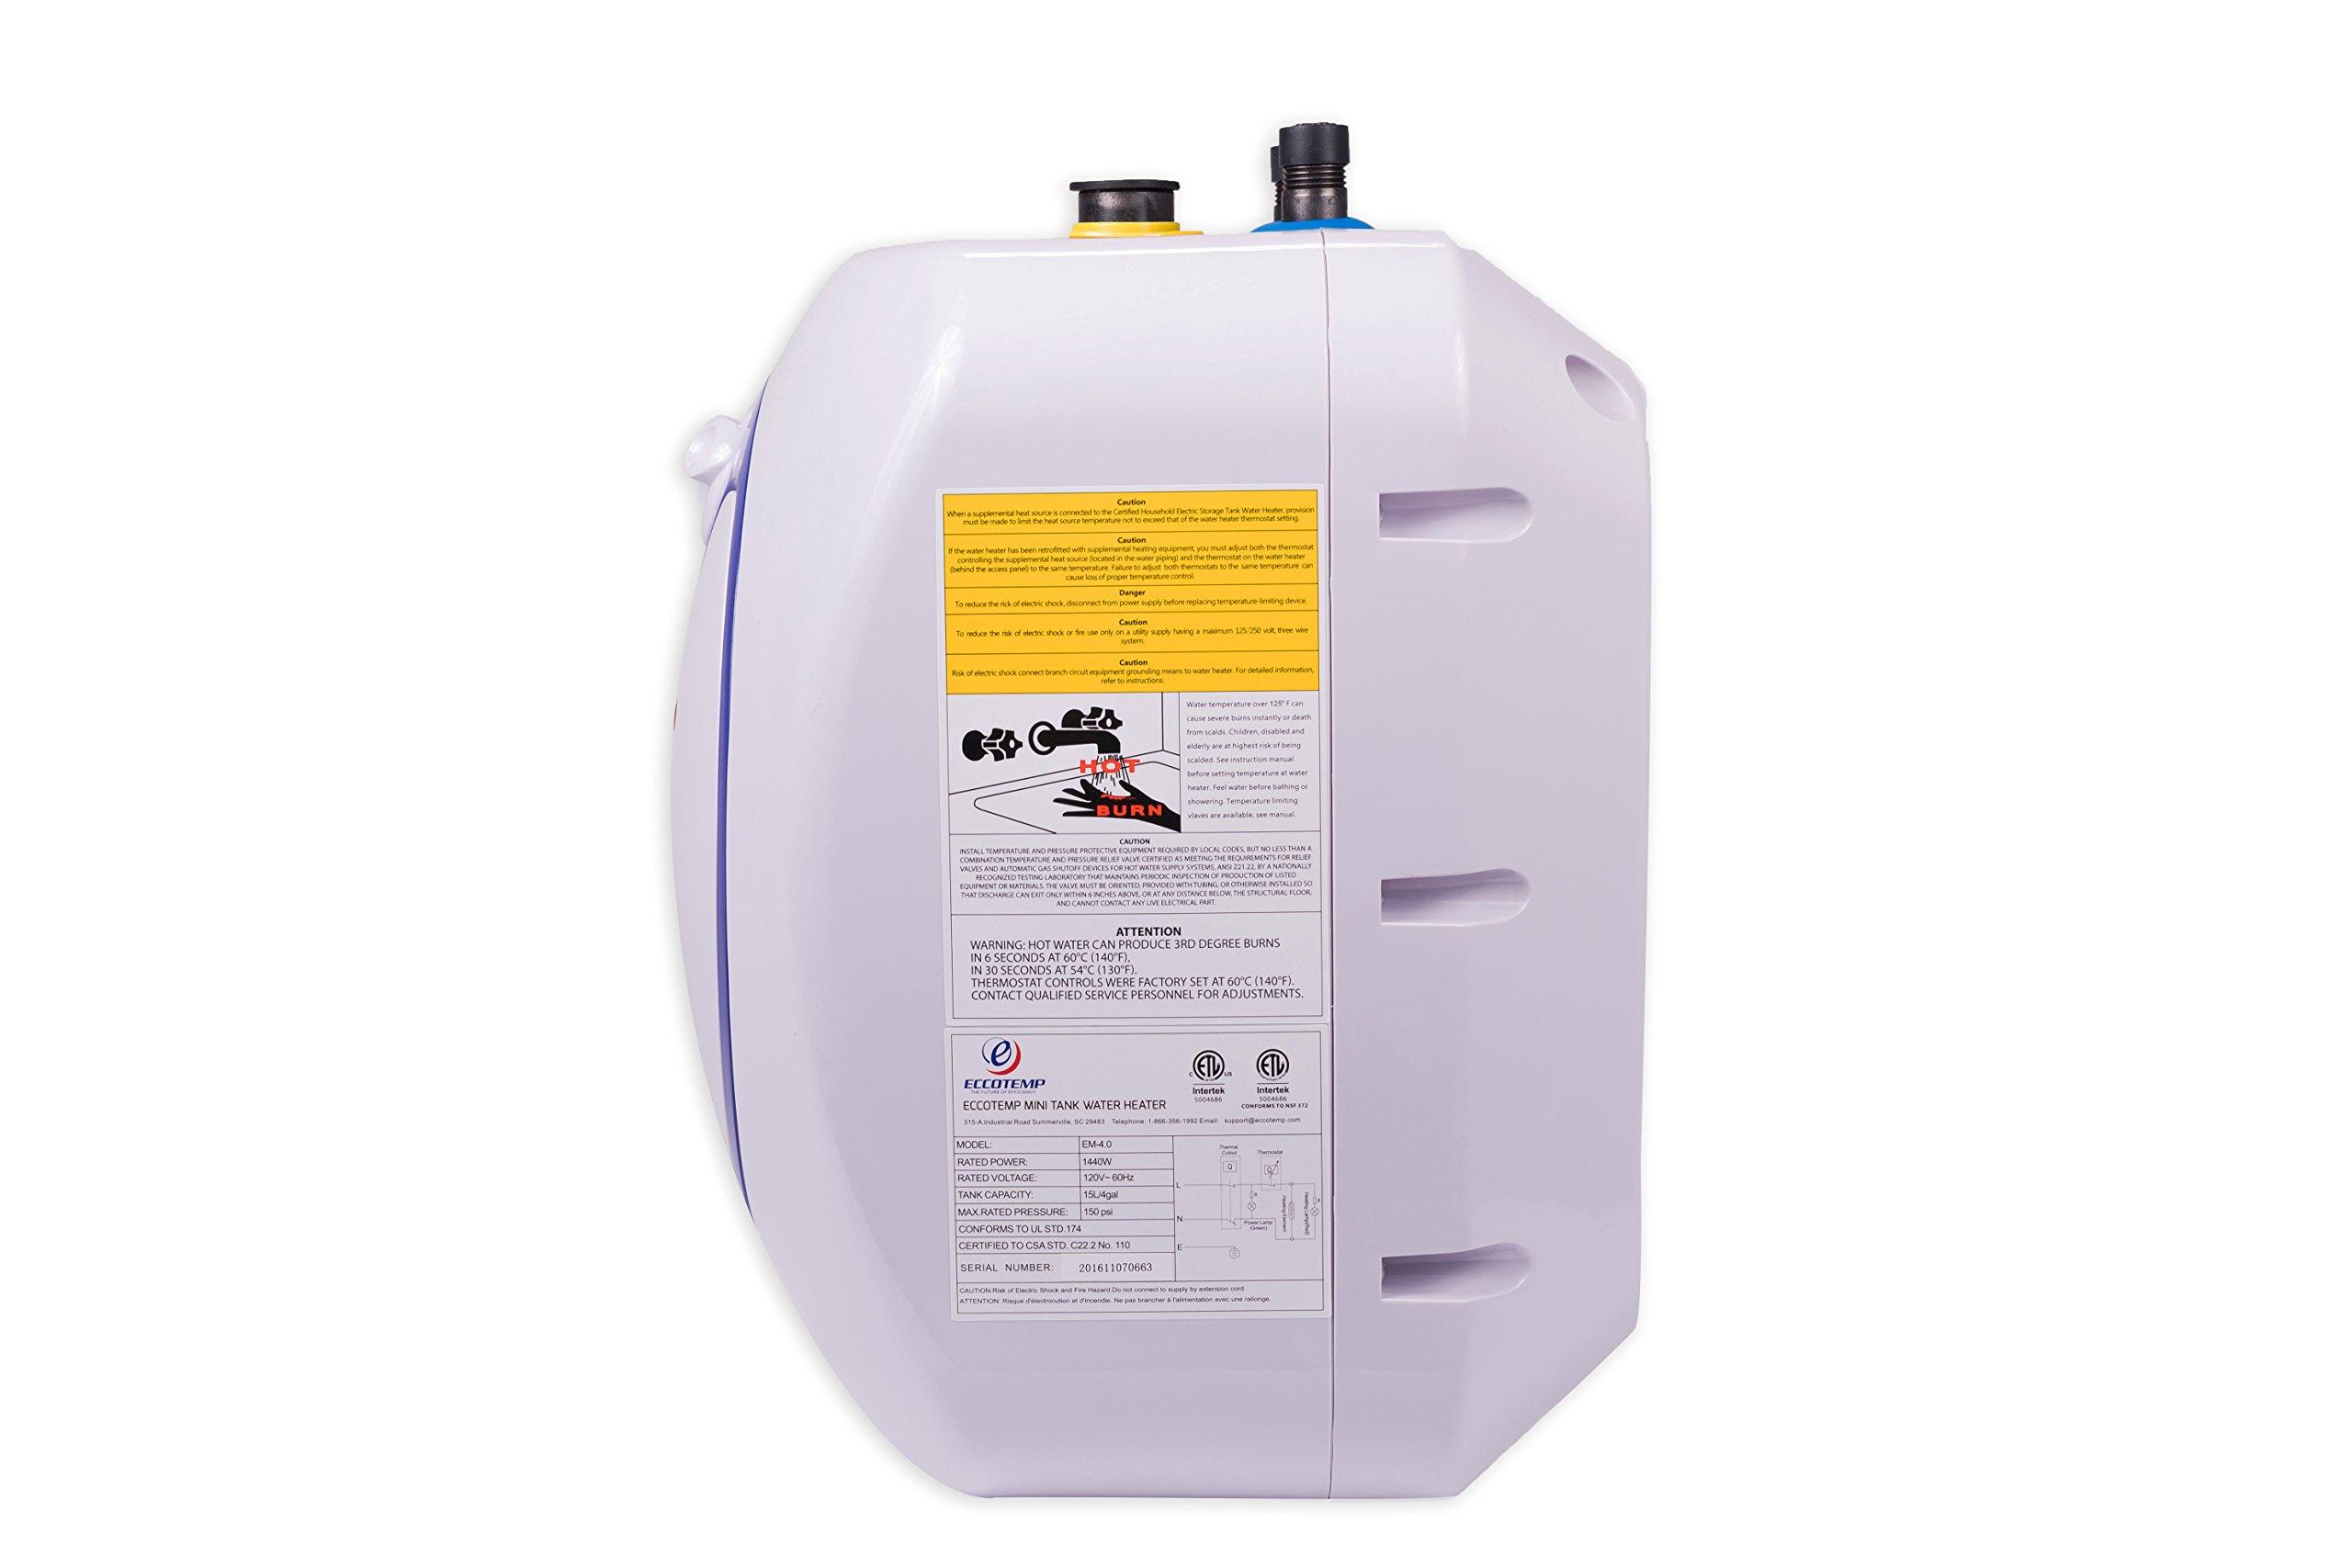 Eccotemp EM-4.0 Electric 4.0-Gallon Mini Tank Water Heater by Eccotemp (Image #2)